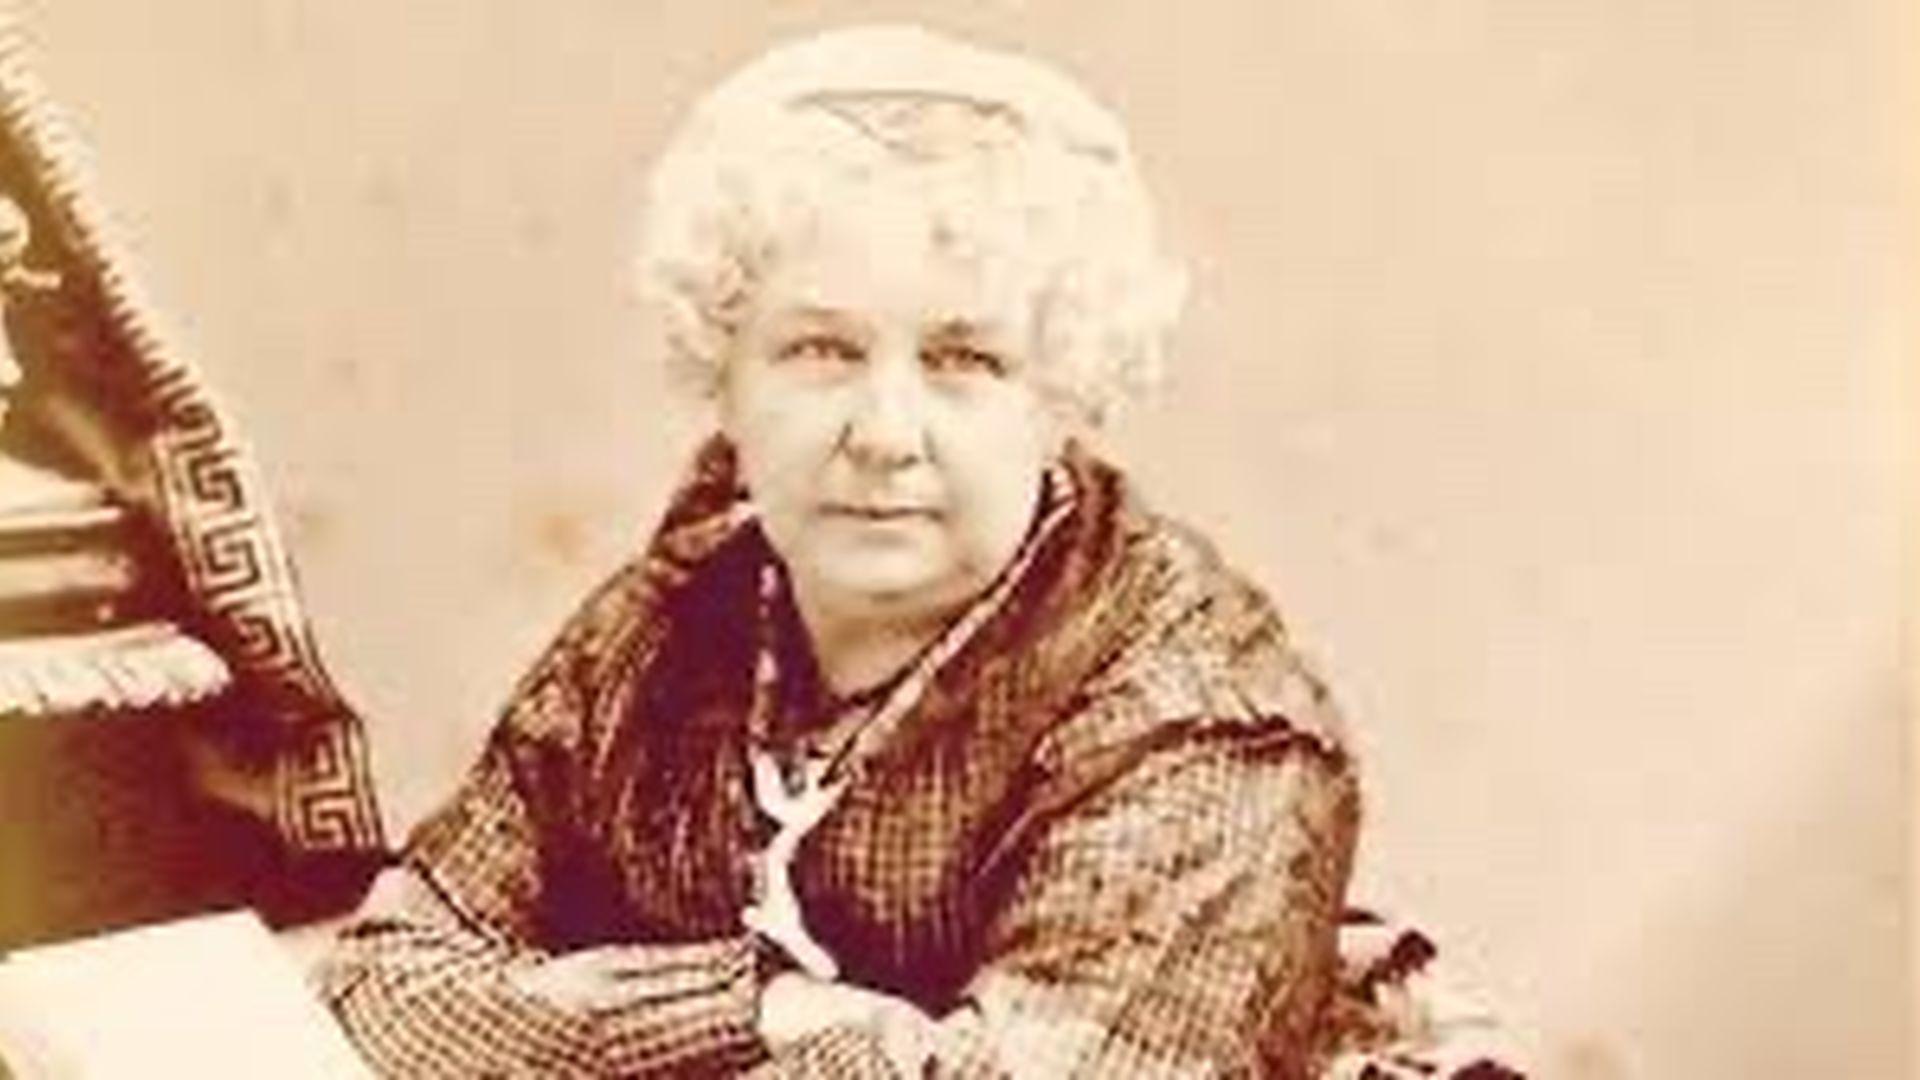 The Great Granddaughter of Elizabeth Cady Stanton